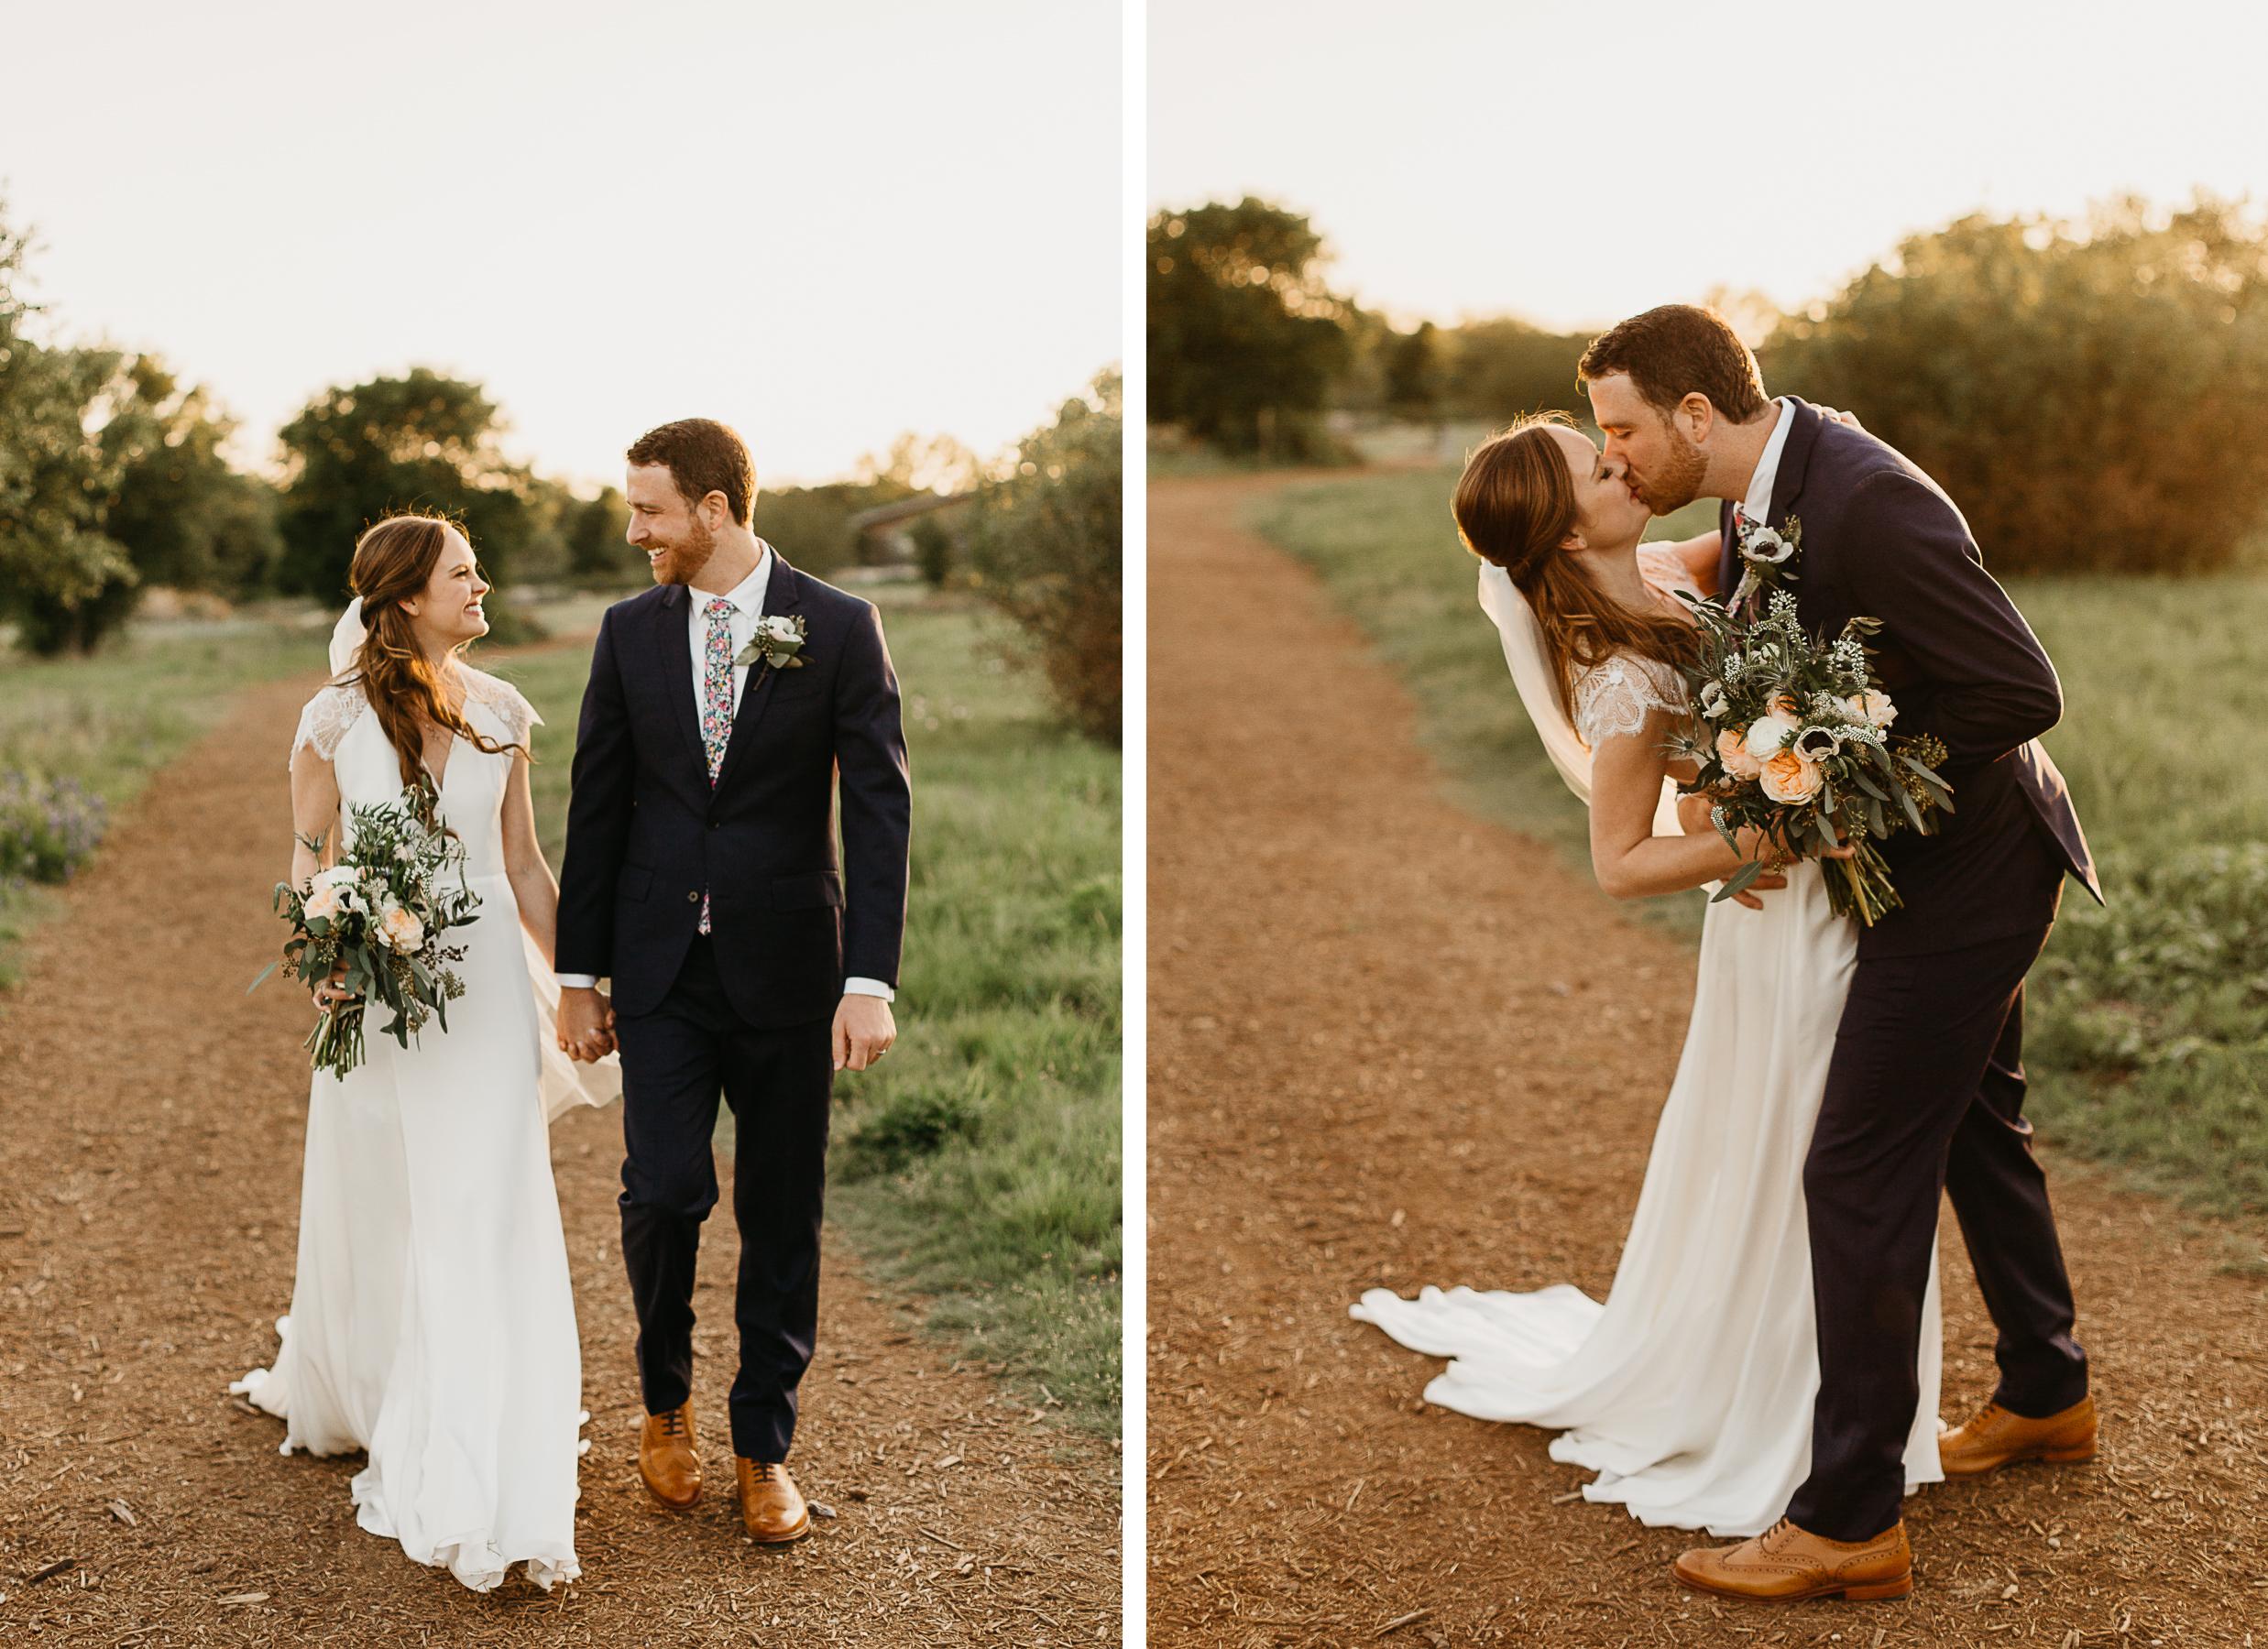 Austin Wedding Photographer Lady Bird Johnson Wildflower Center Wedding 10.jpg